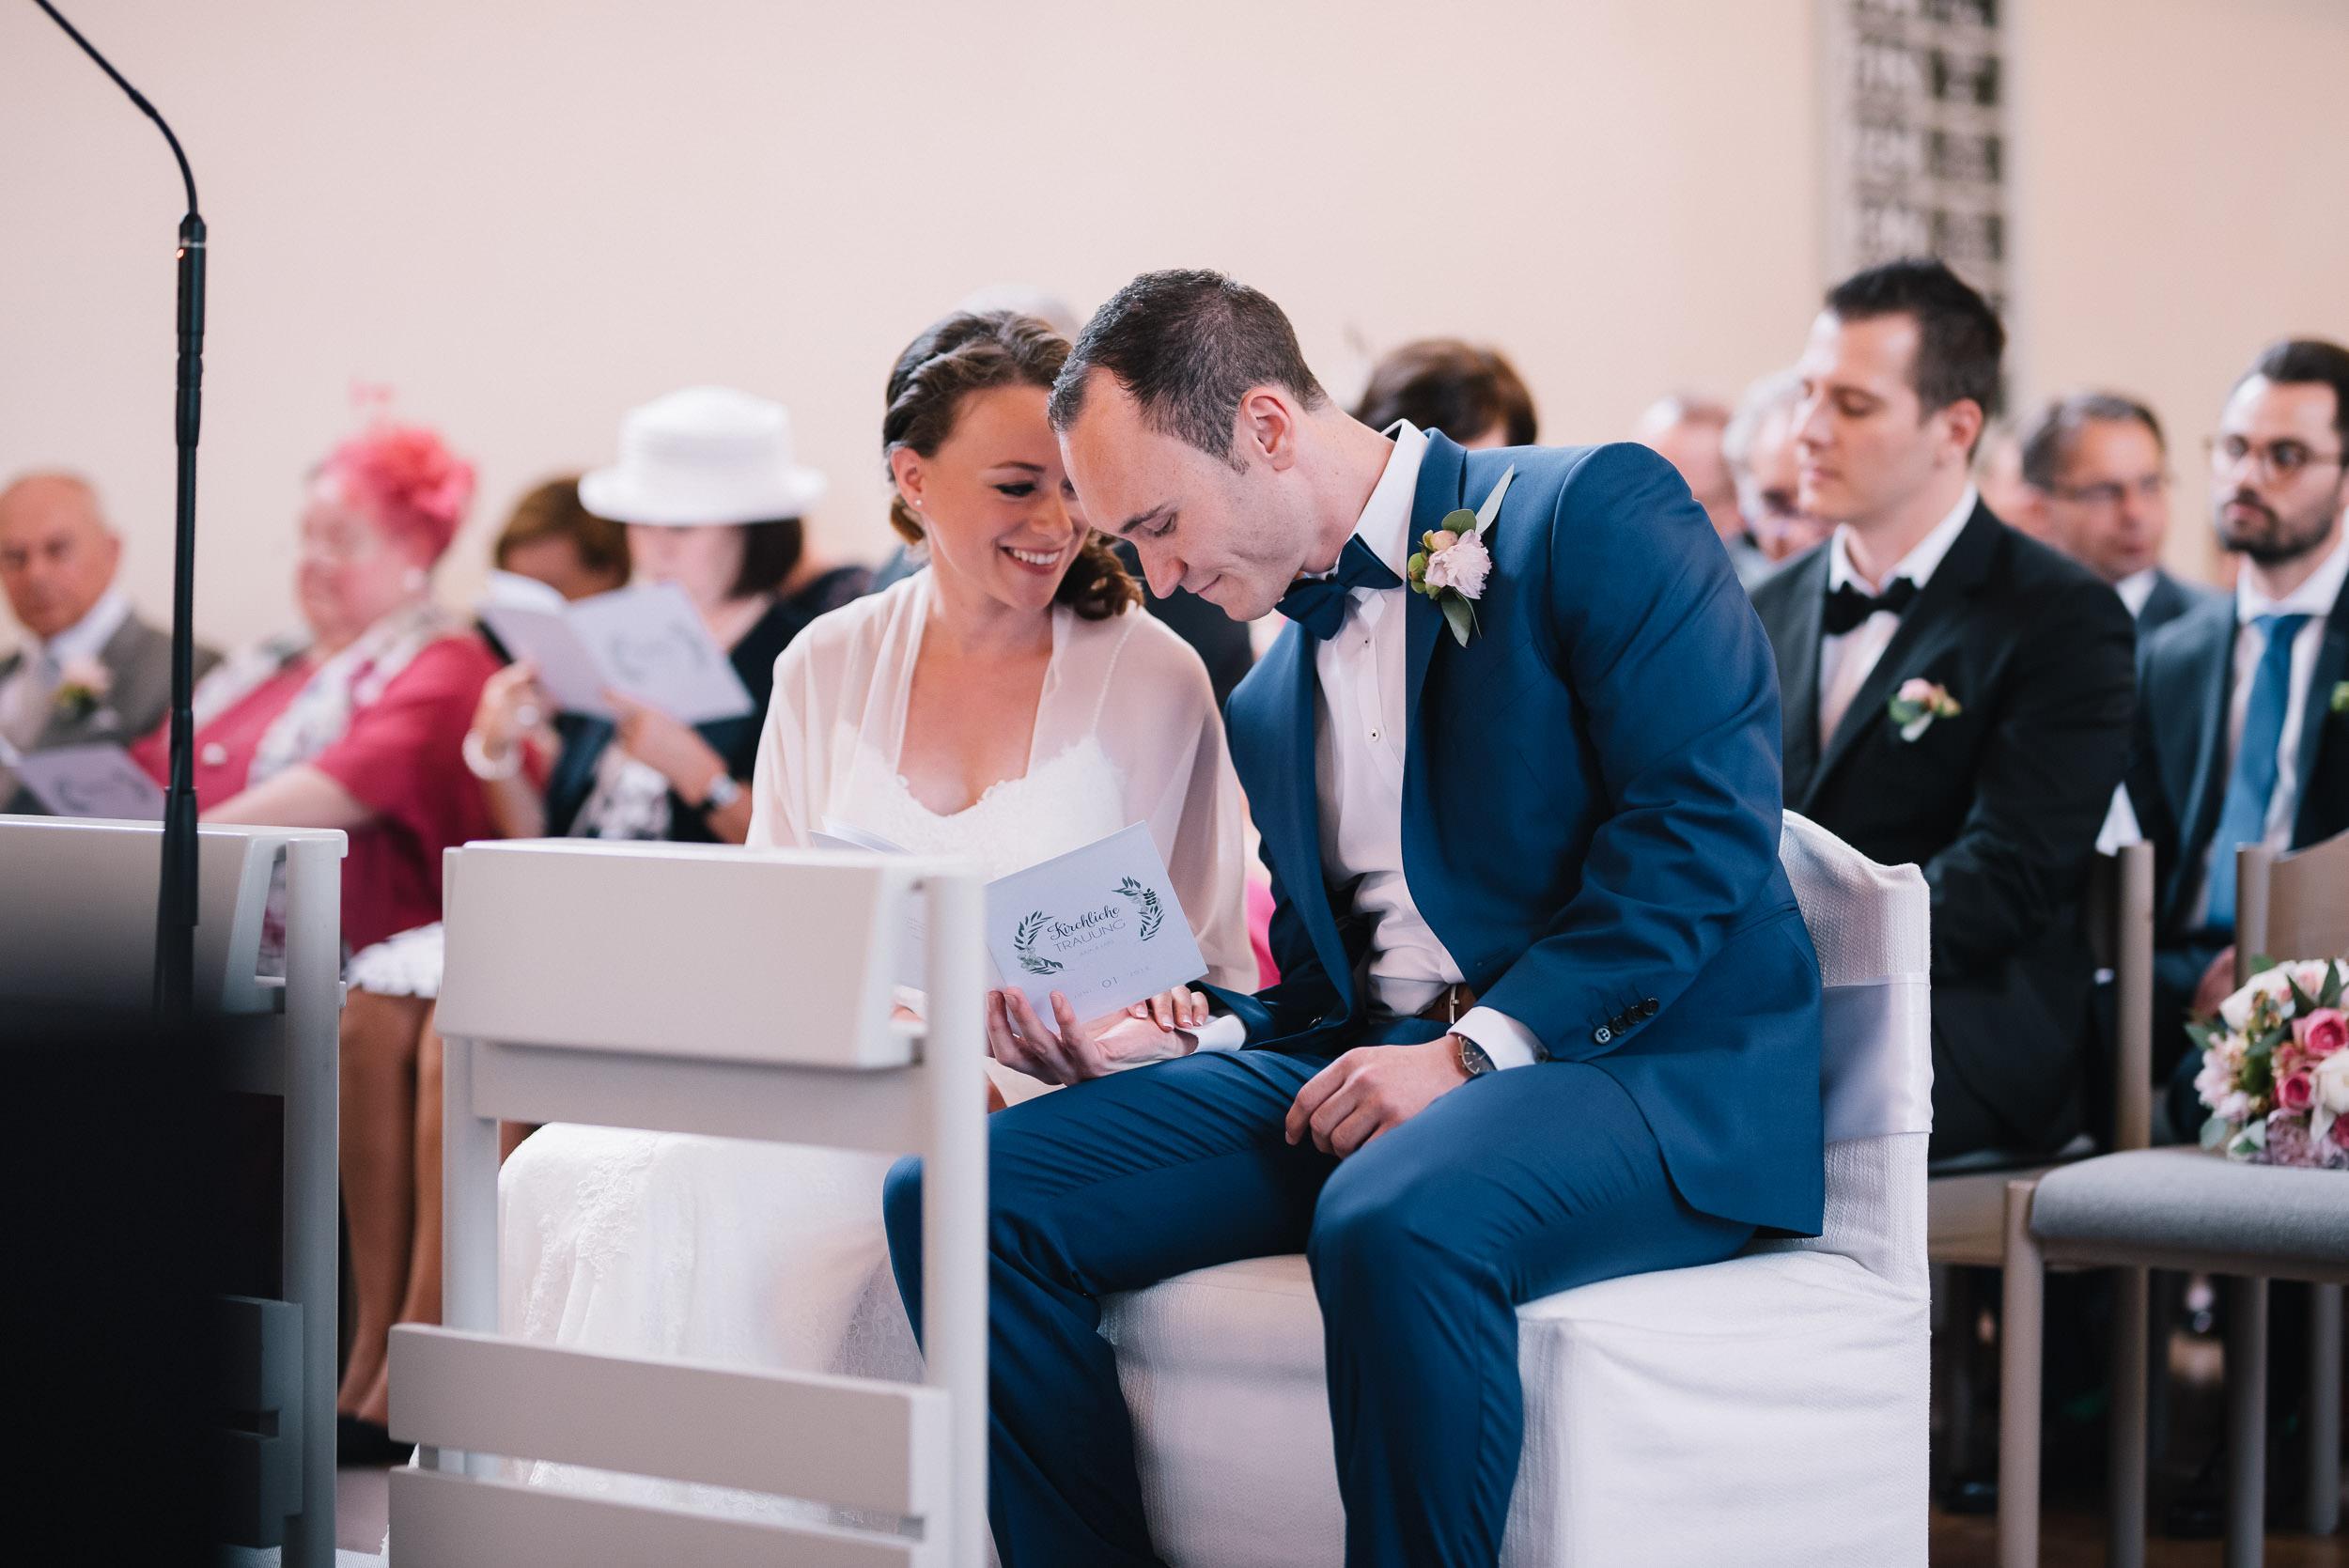 Hochzeit-Julia+Lars-Leimen+Bonsaizentrum-HD-027.jpg